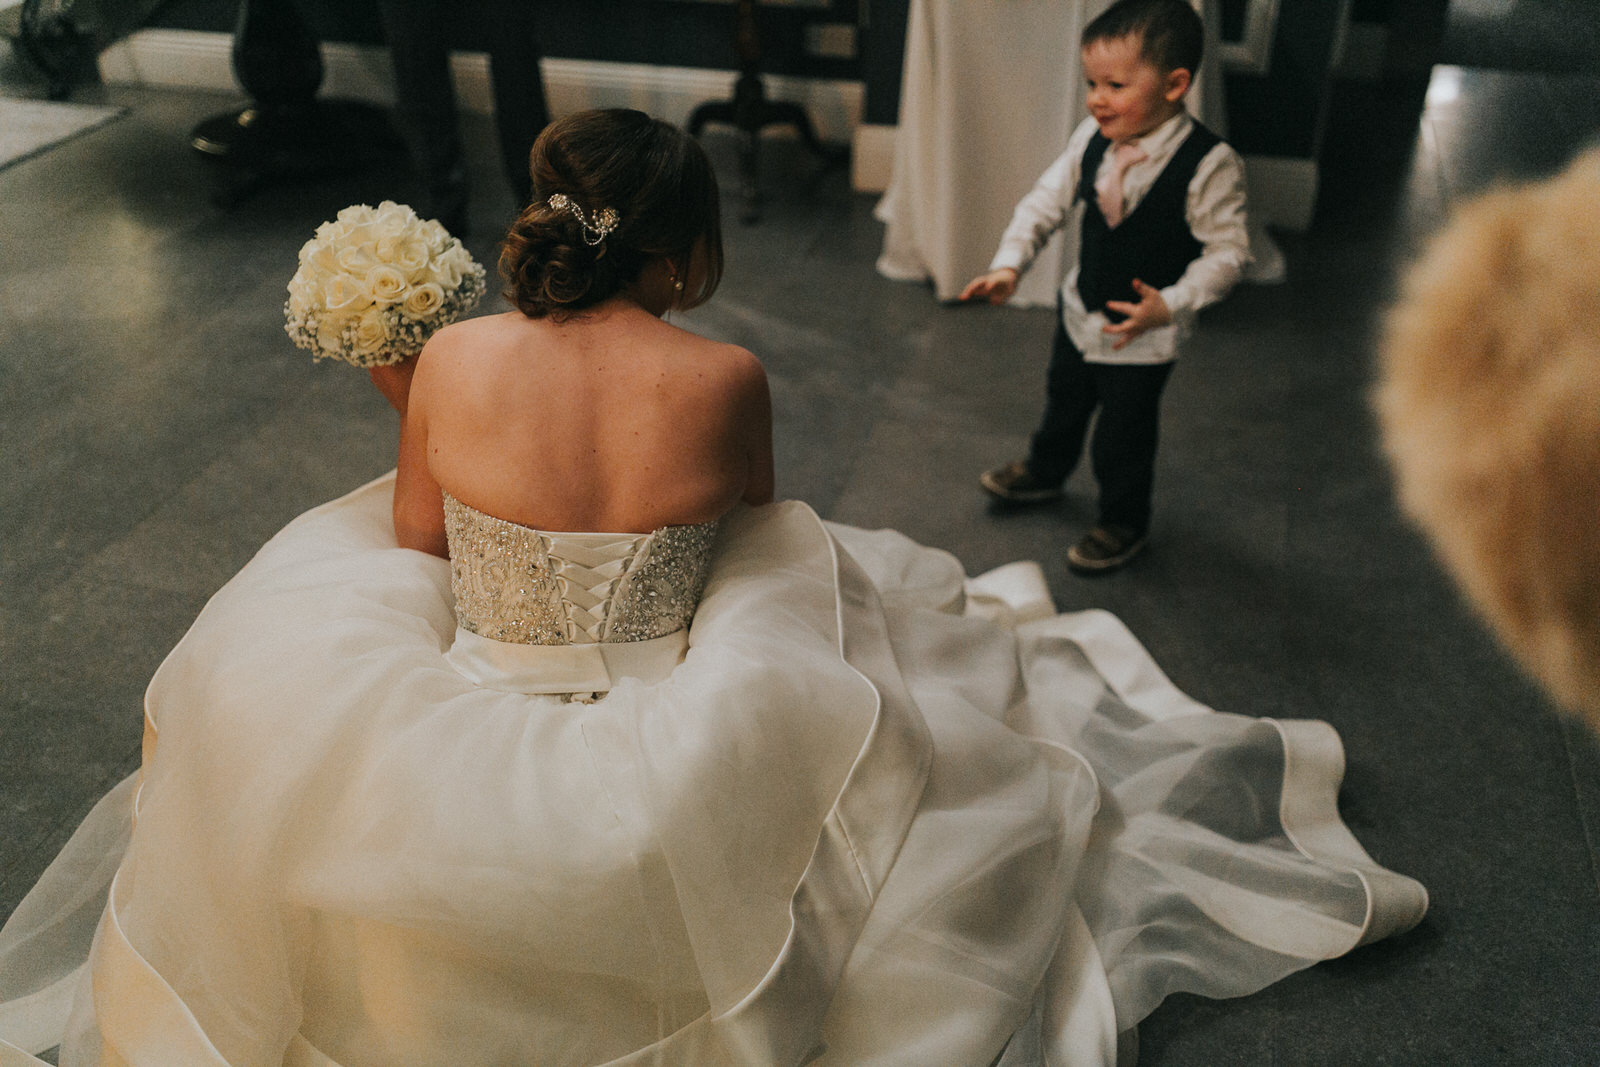 Clonabreany_wedding-photographer_roger_kenny_ireland_099.jpg